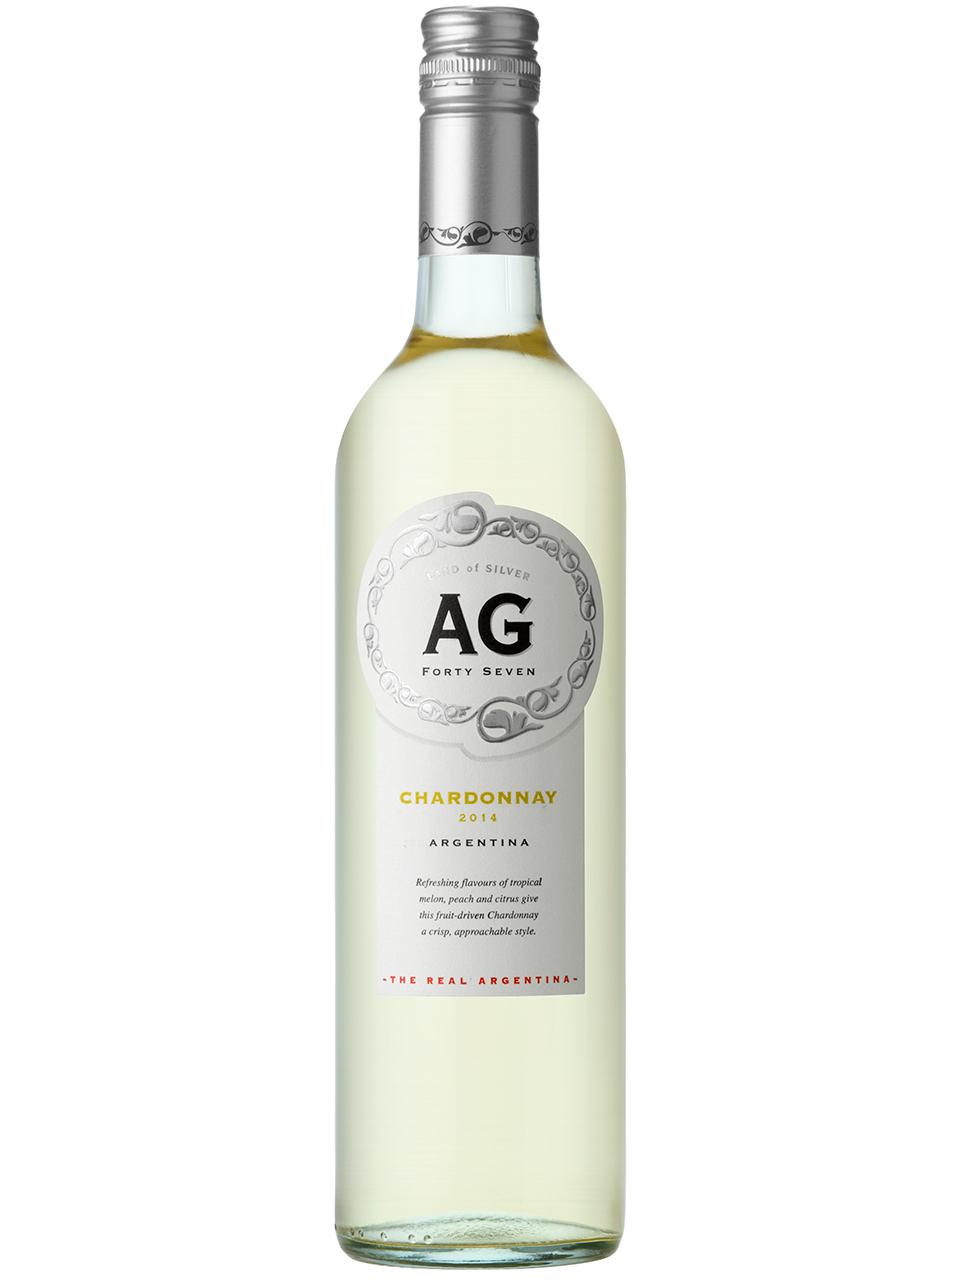 AG Forty-Seven Chardonnay